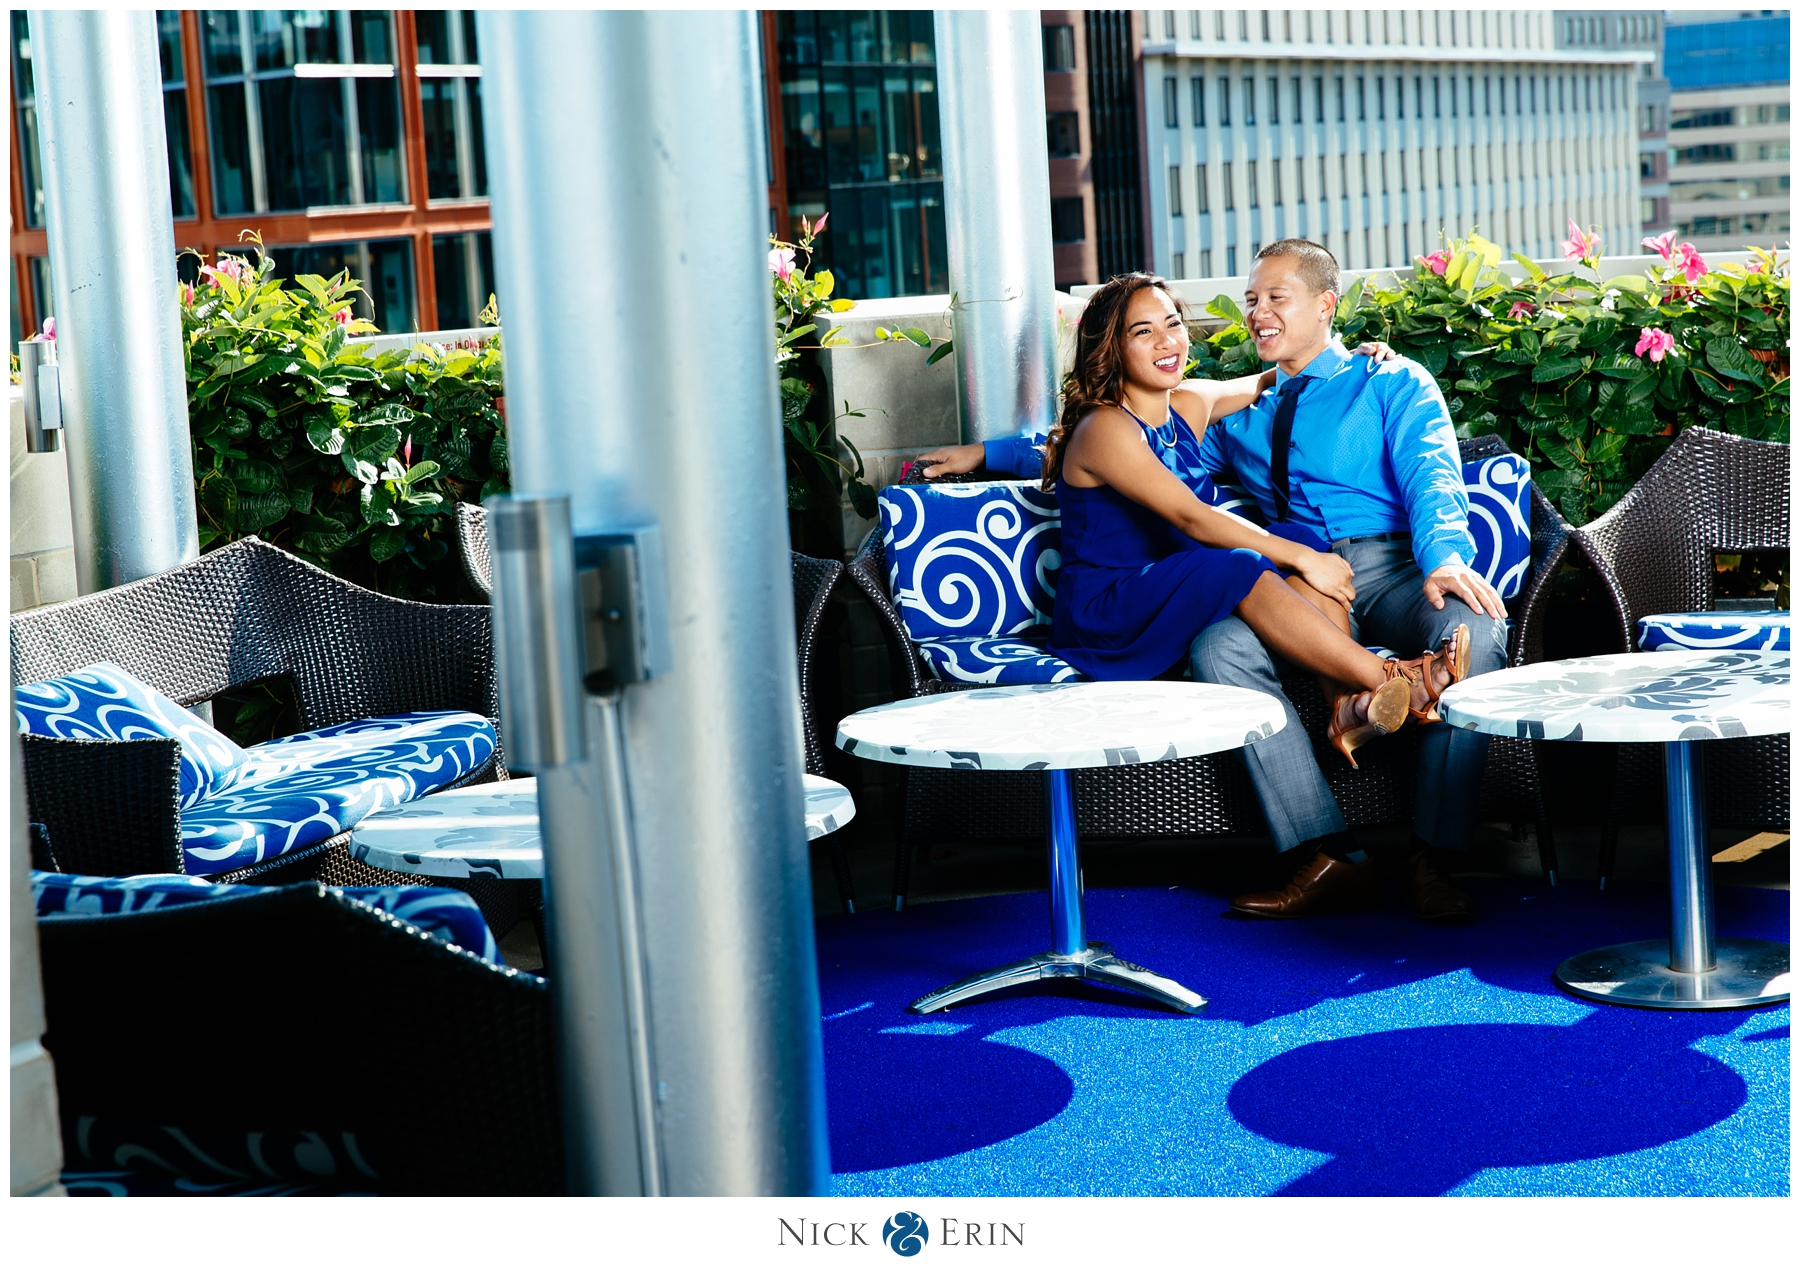 Donner_Photography_Washington DC Engagement Session_Jenny Mae & Vic_0007